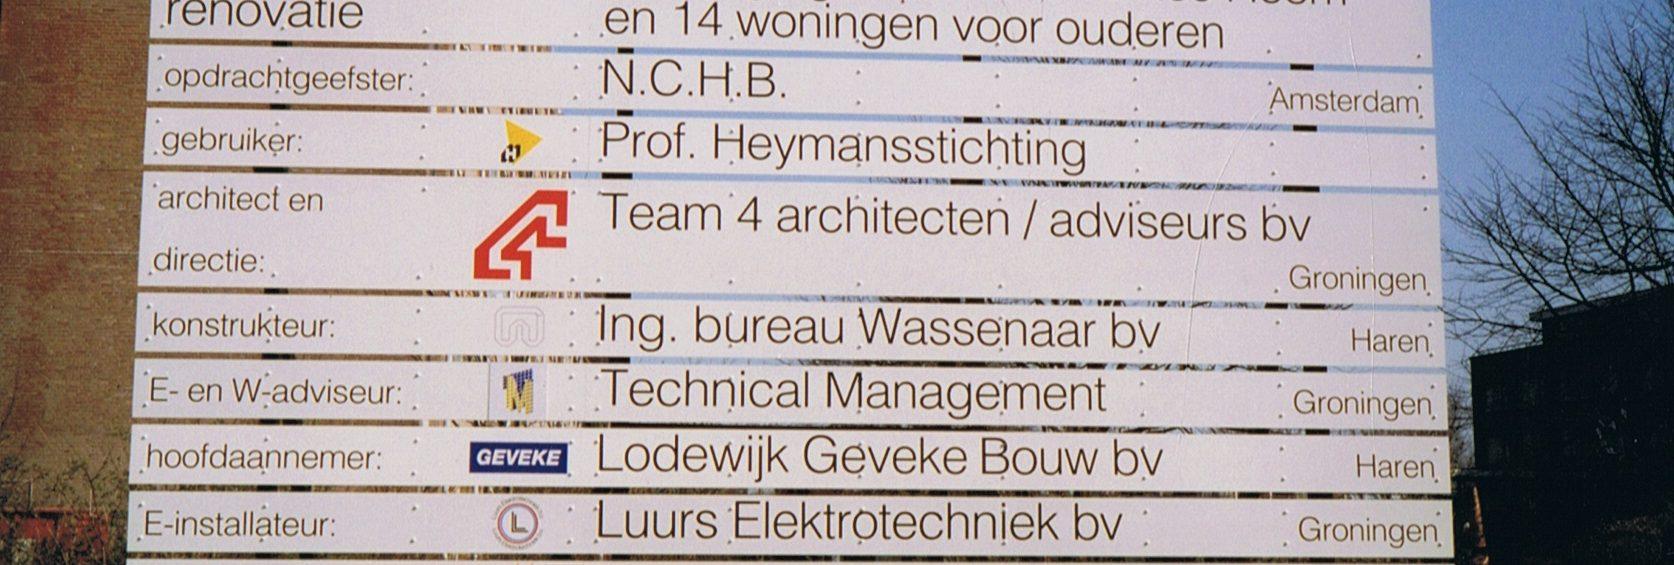 1994.19 - Heymanscentrum - Hoornseheem - renovatie -1994